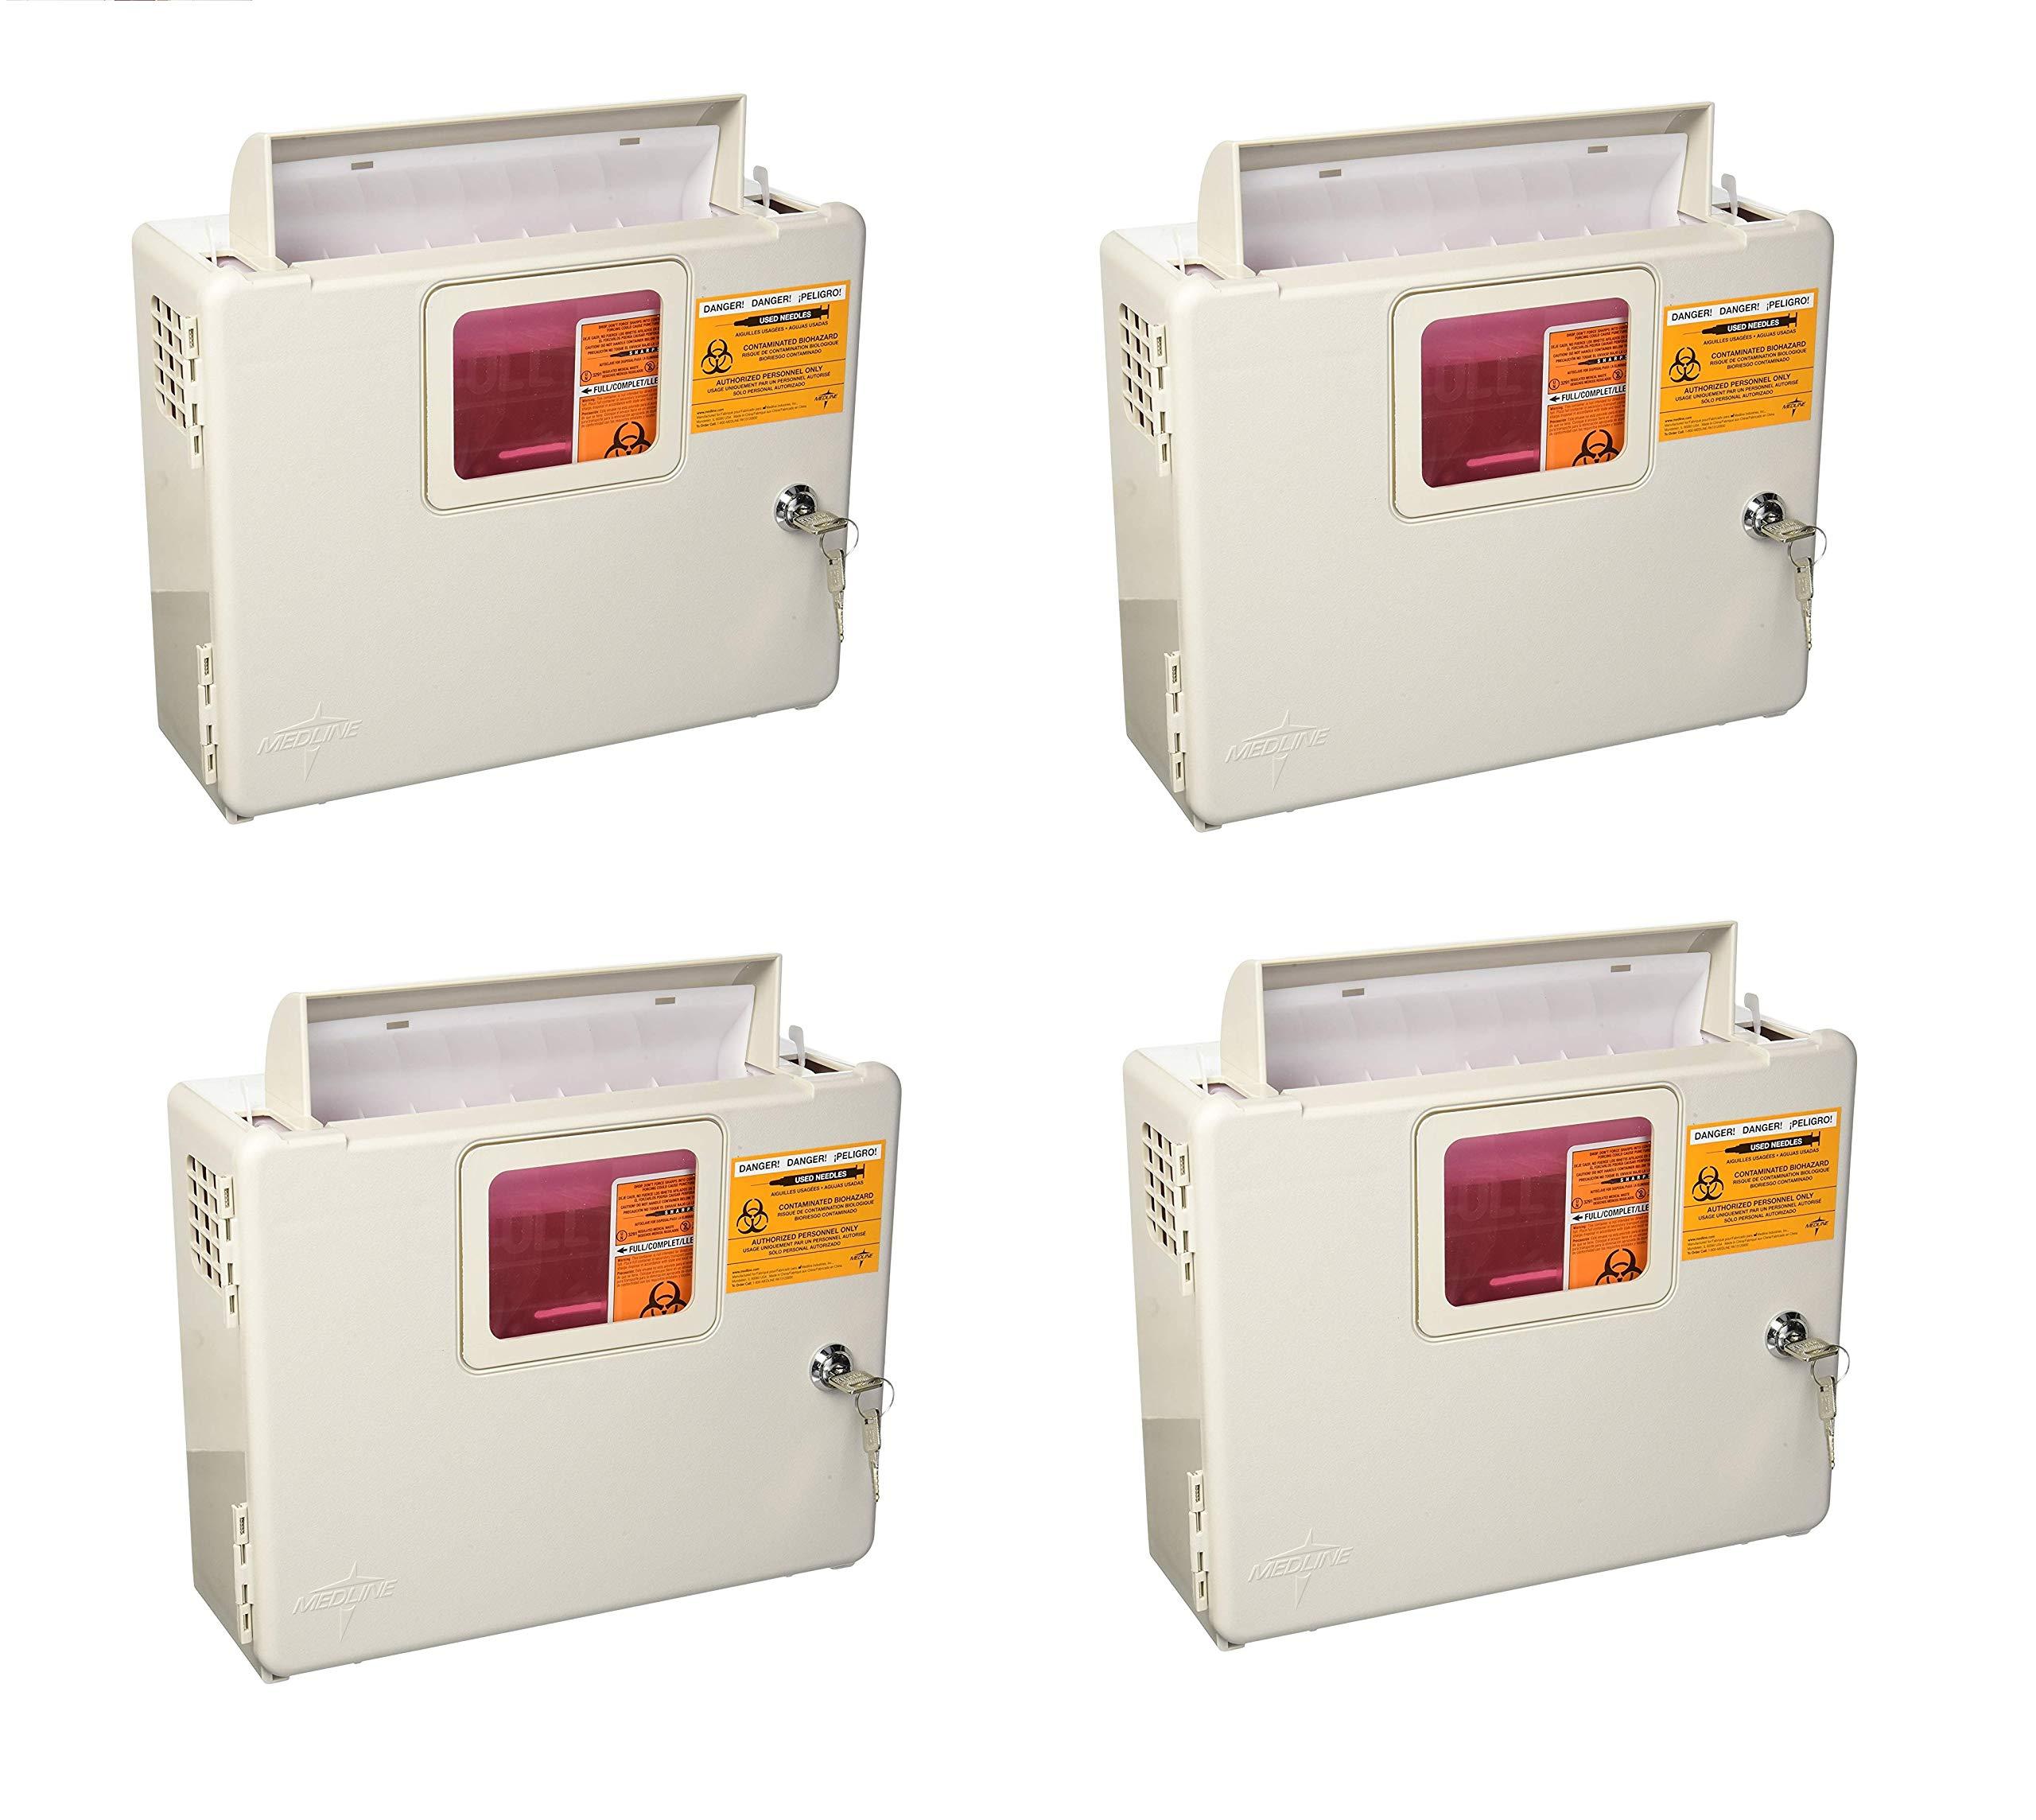 Kendall Wall Cabinet F/5Qt Sharps - Model 85161h (4 Pck)